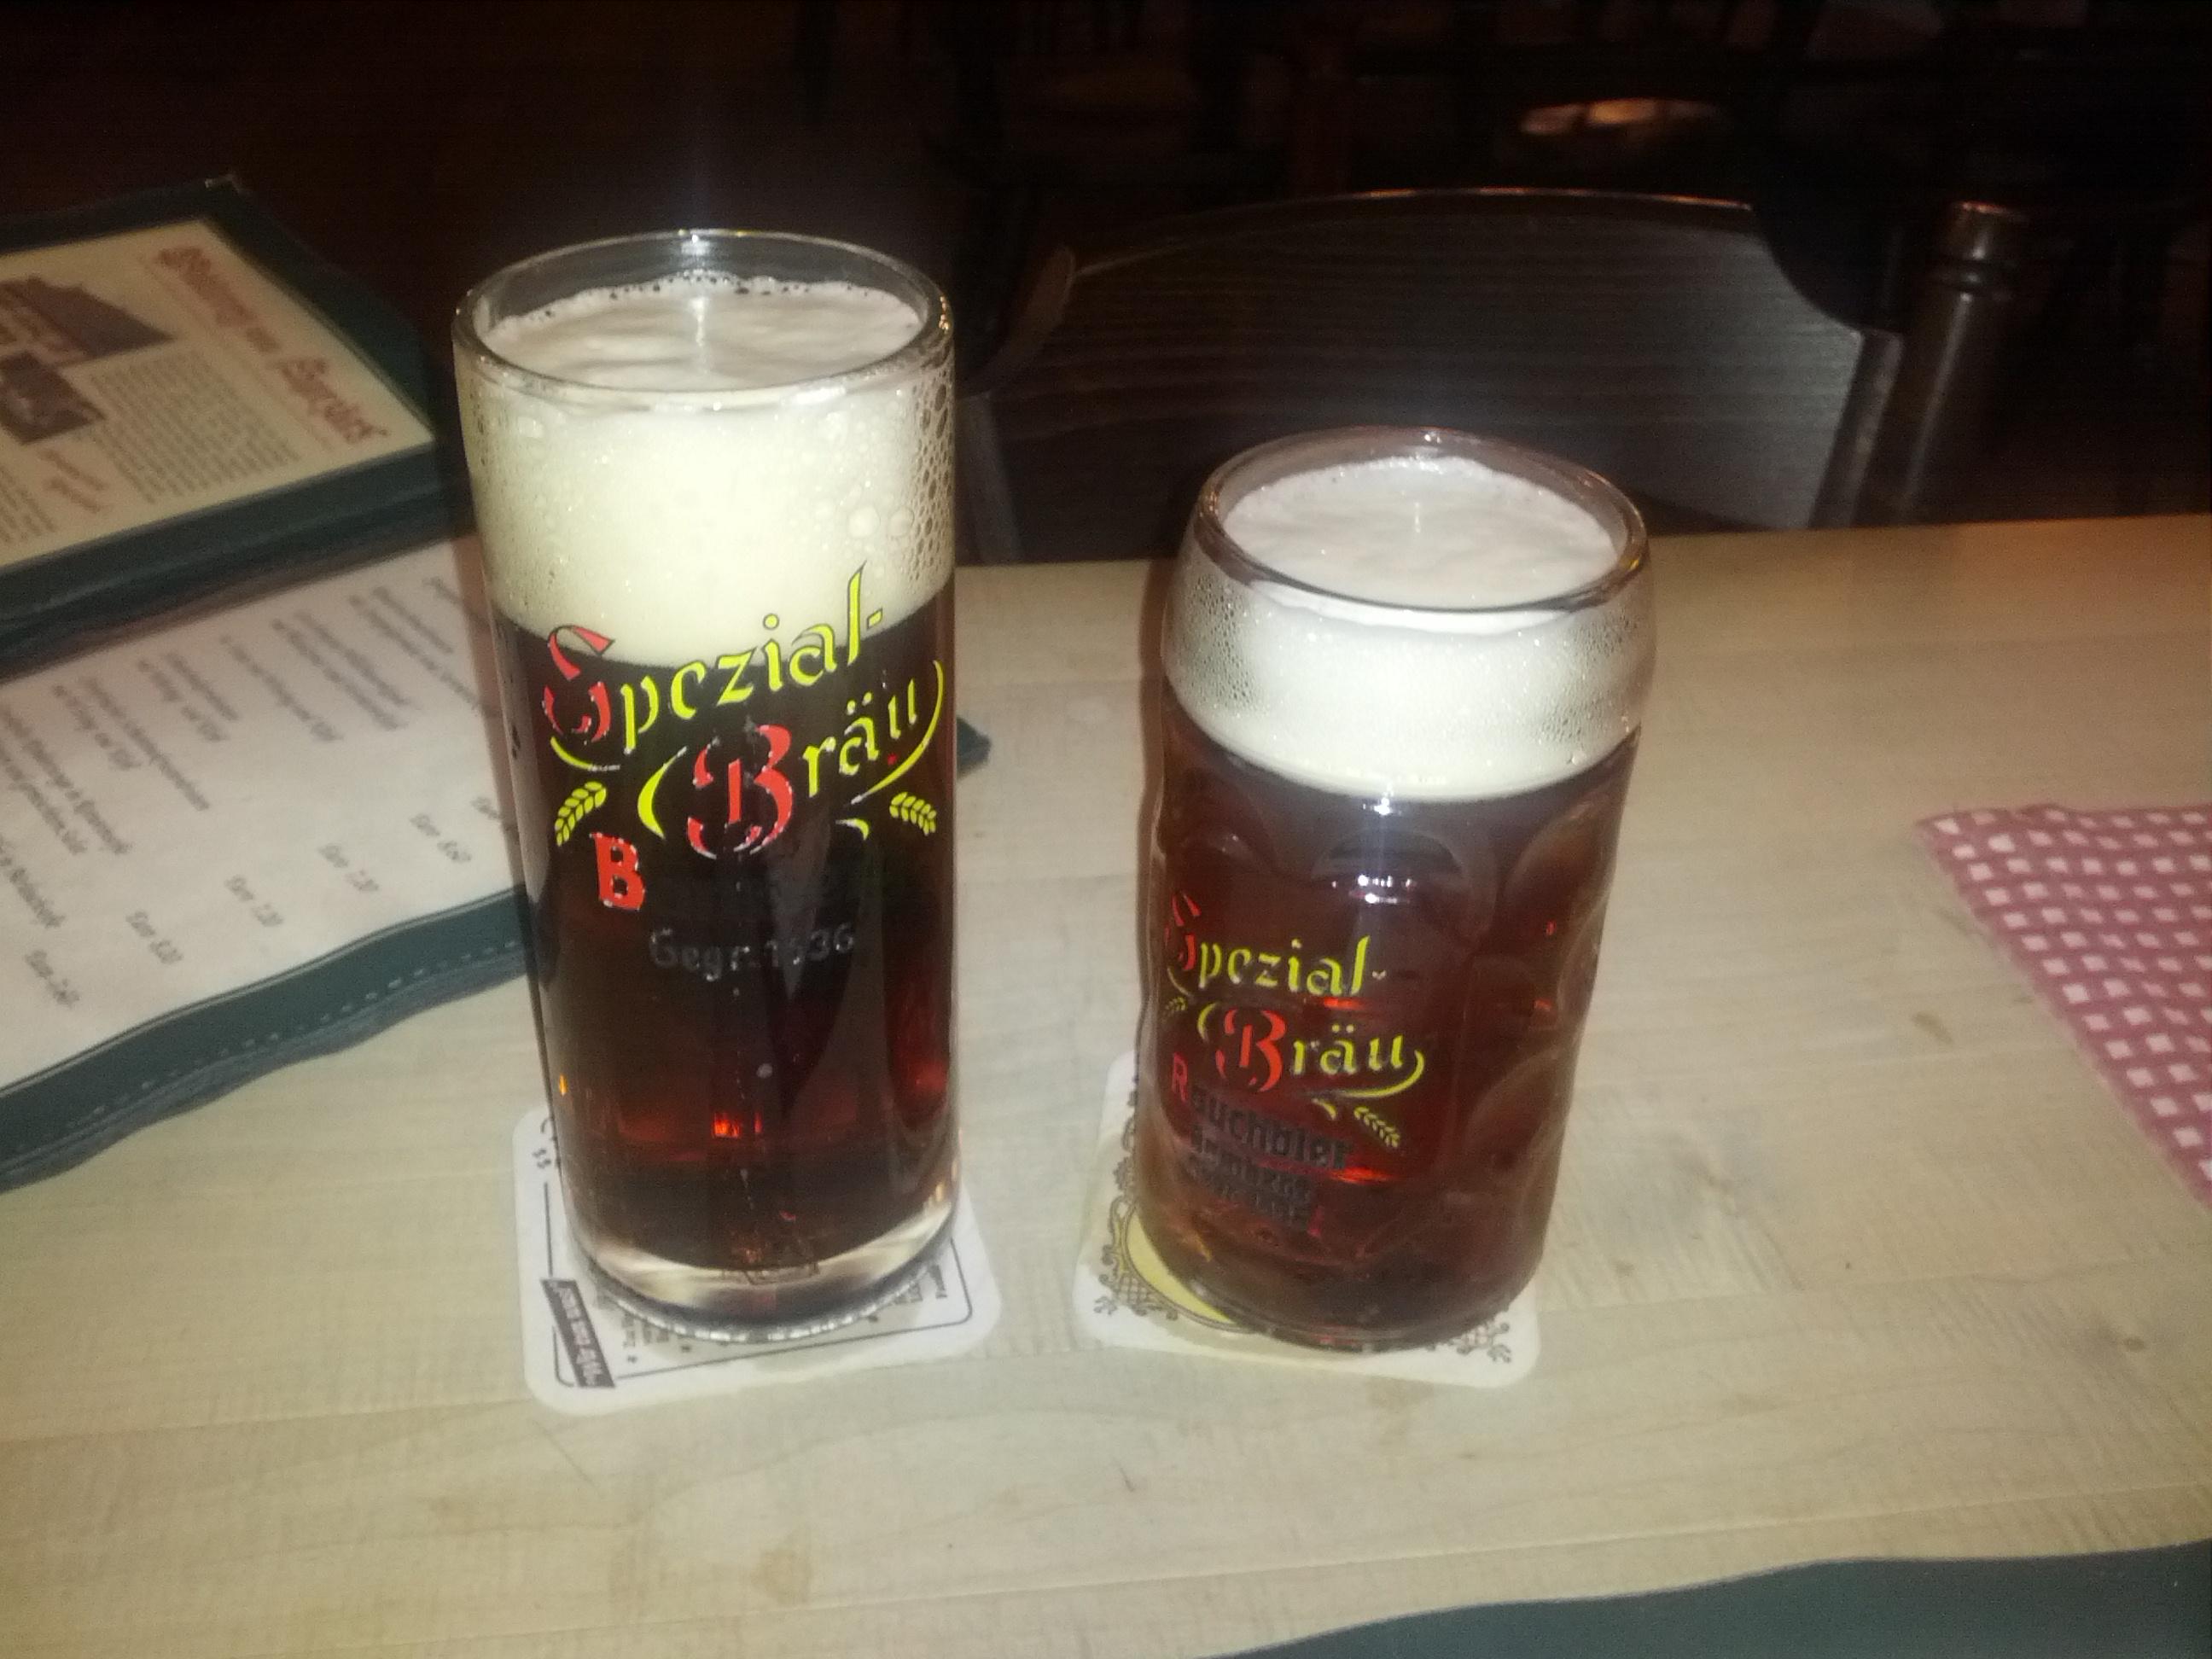 Brauerei Spezial Wikipedia